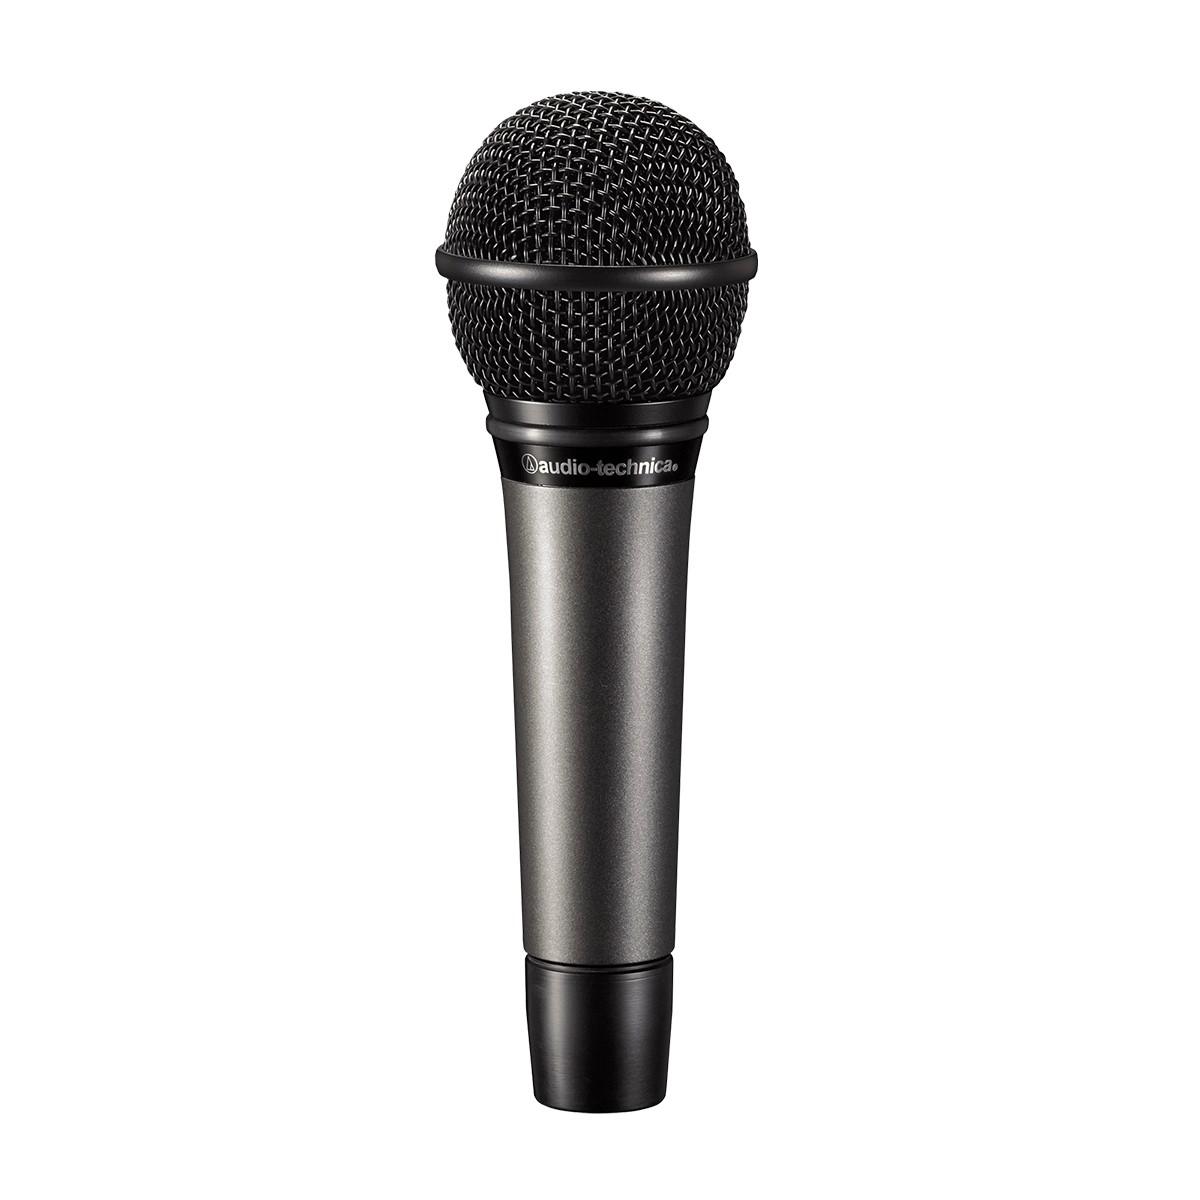 Microfone Cardioide para Vocal Audio-Technica ATM510